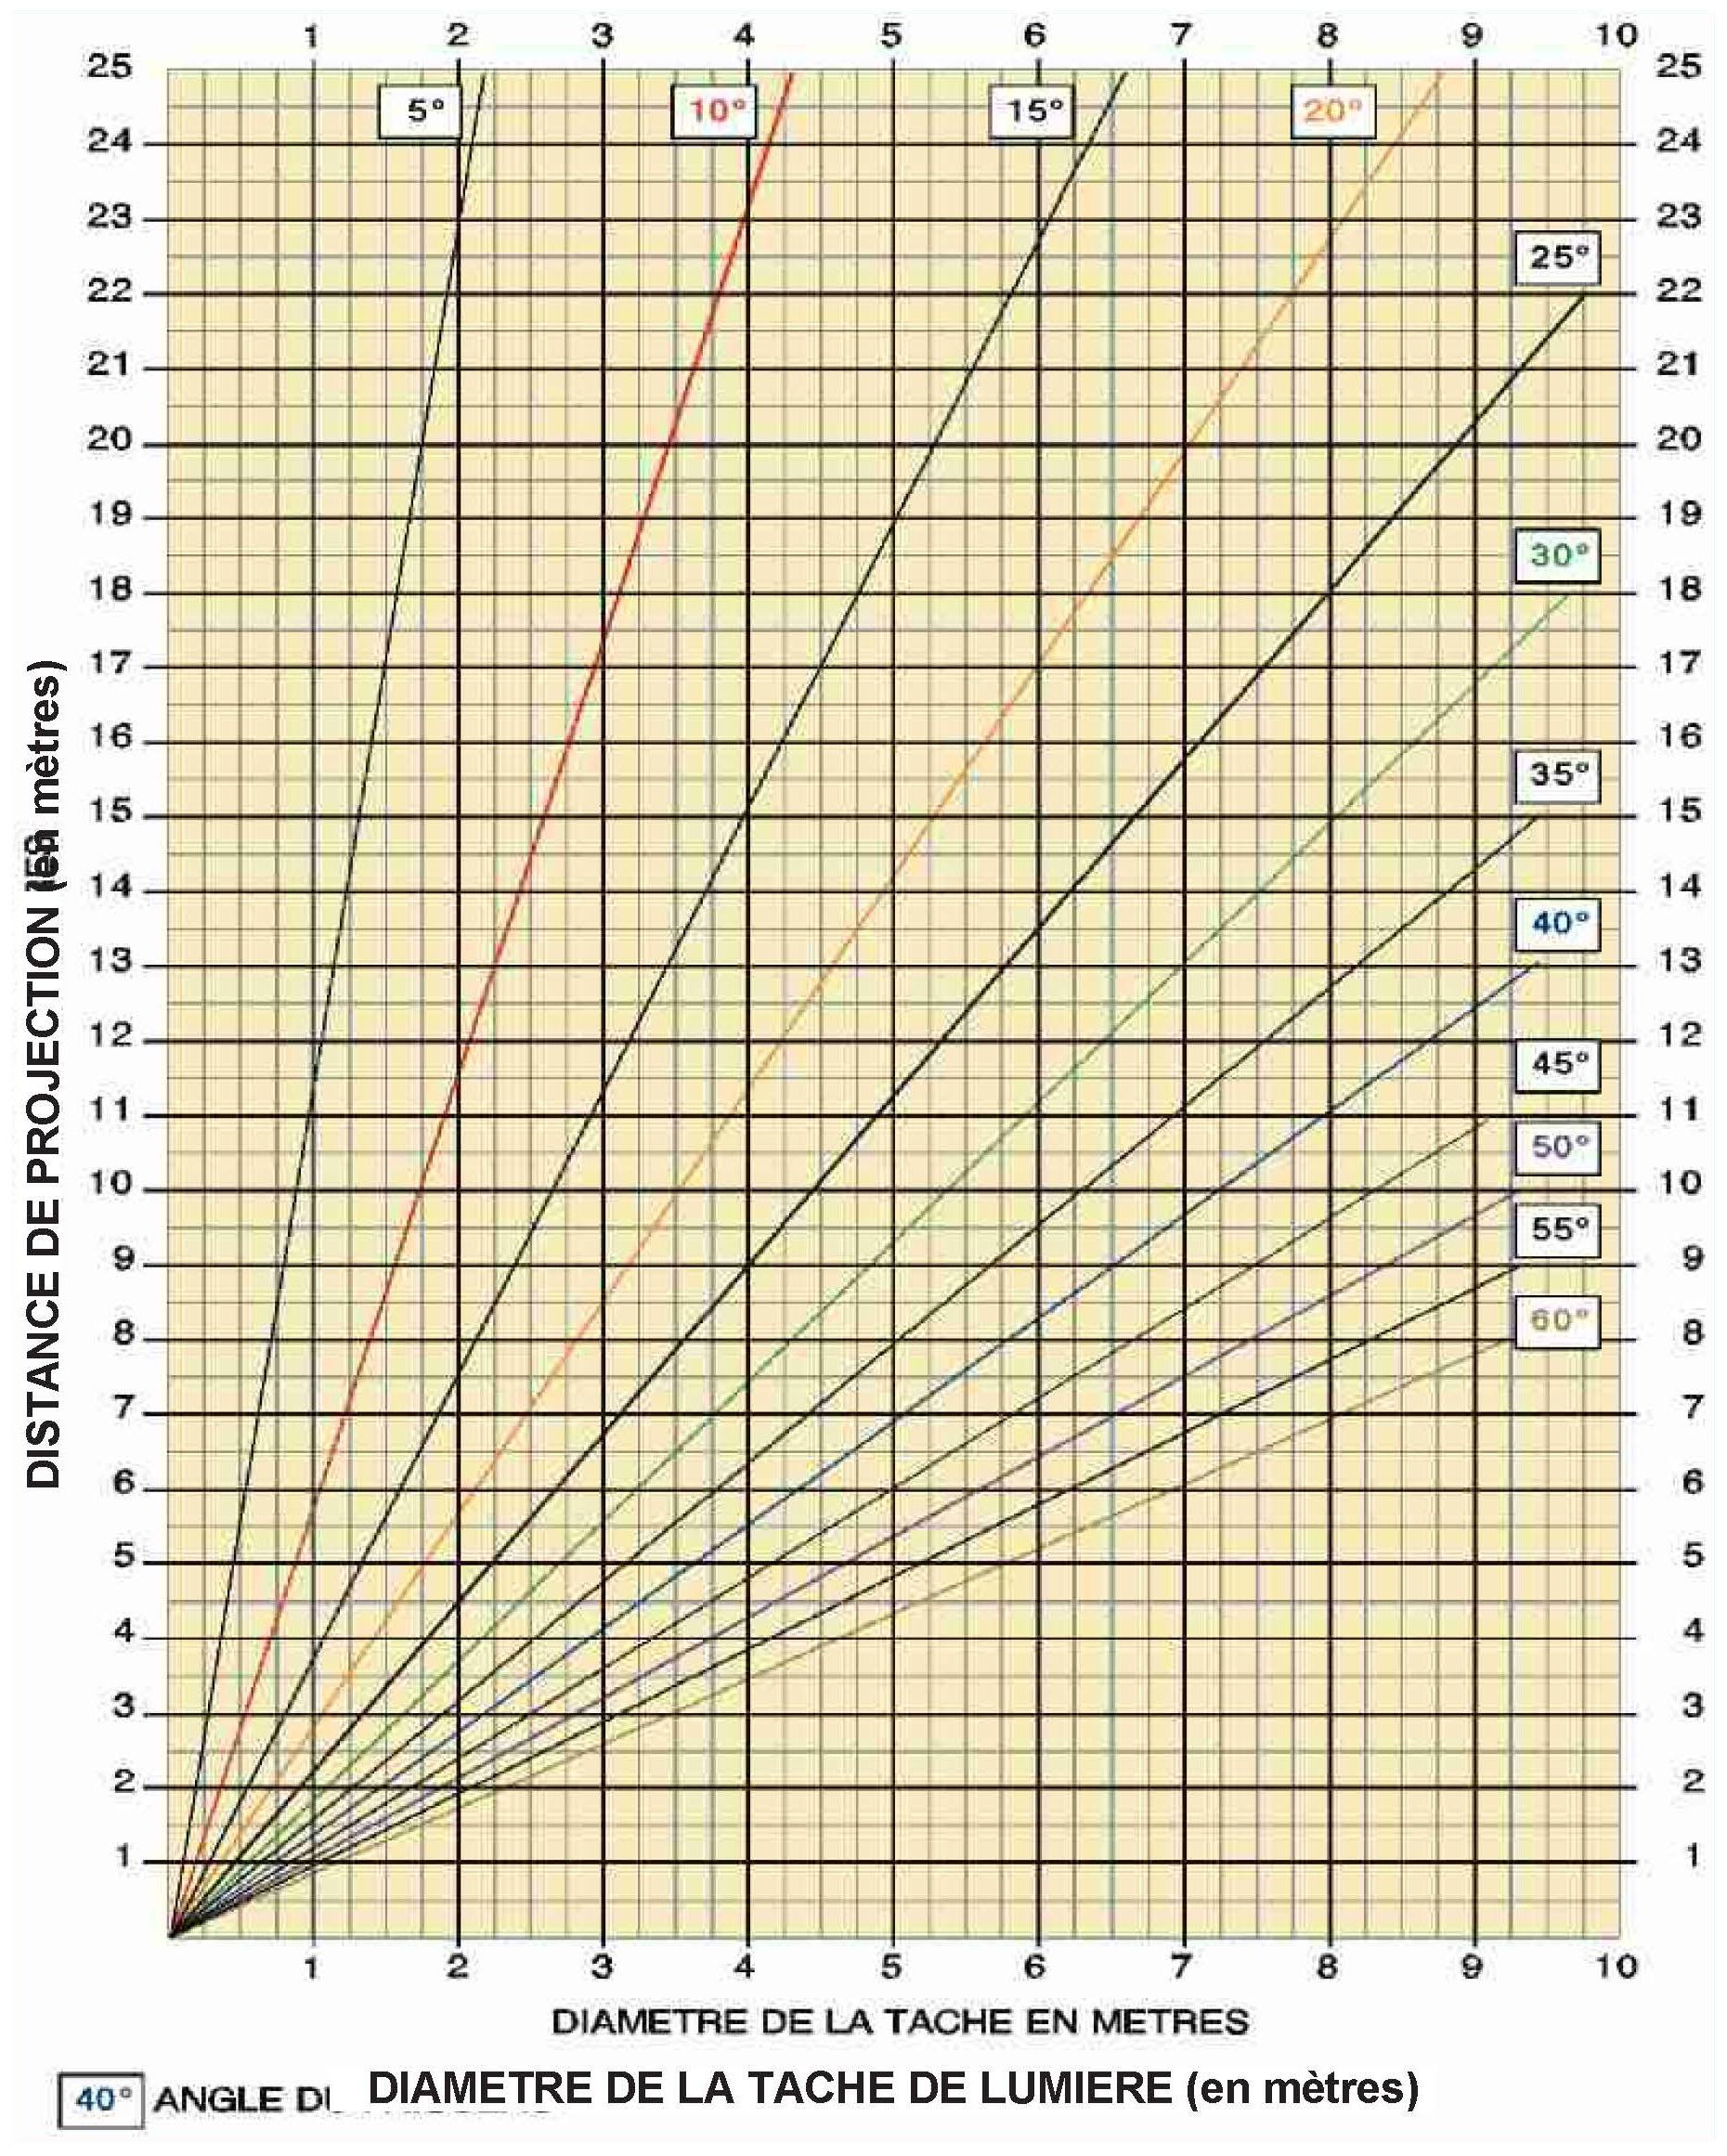 Tableau - diamètre du faisceau selon angle et distance